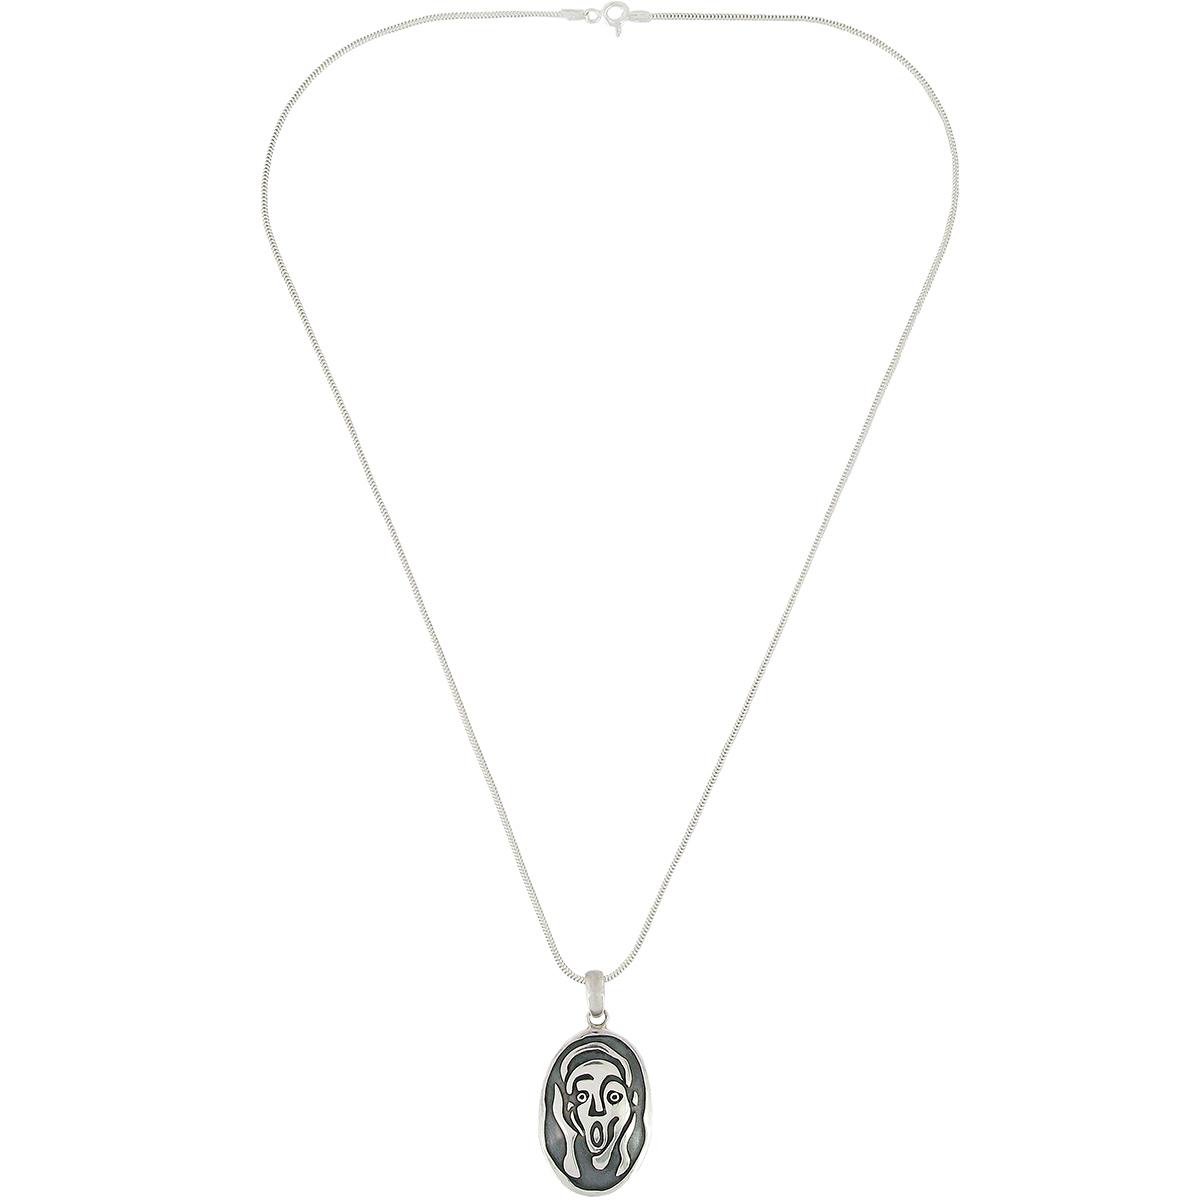 The Scream Pendant Necklace